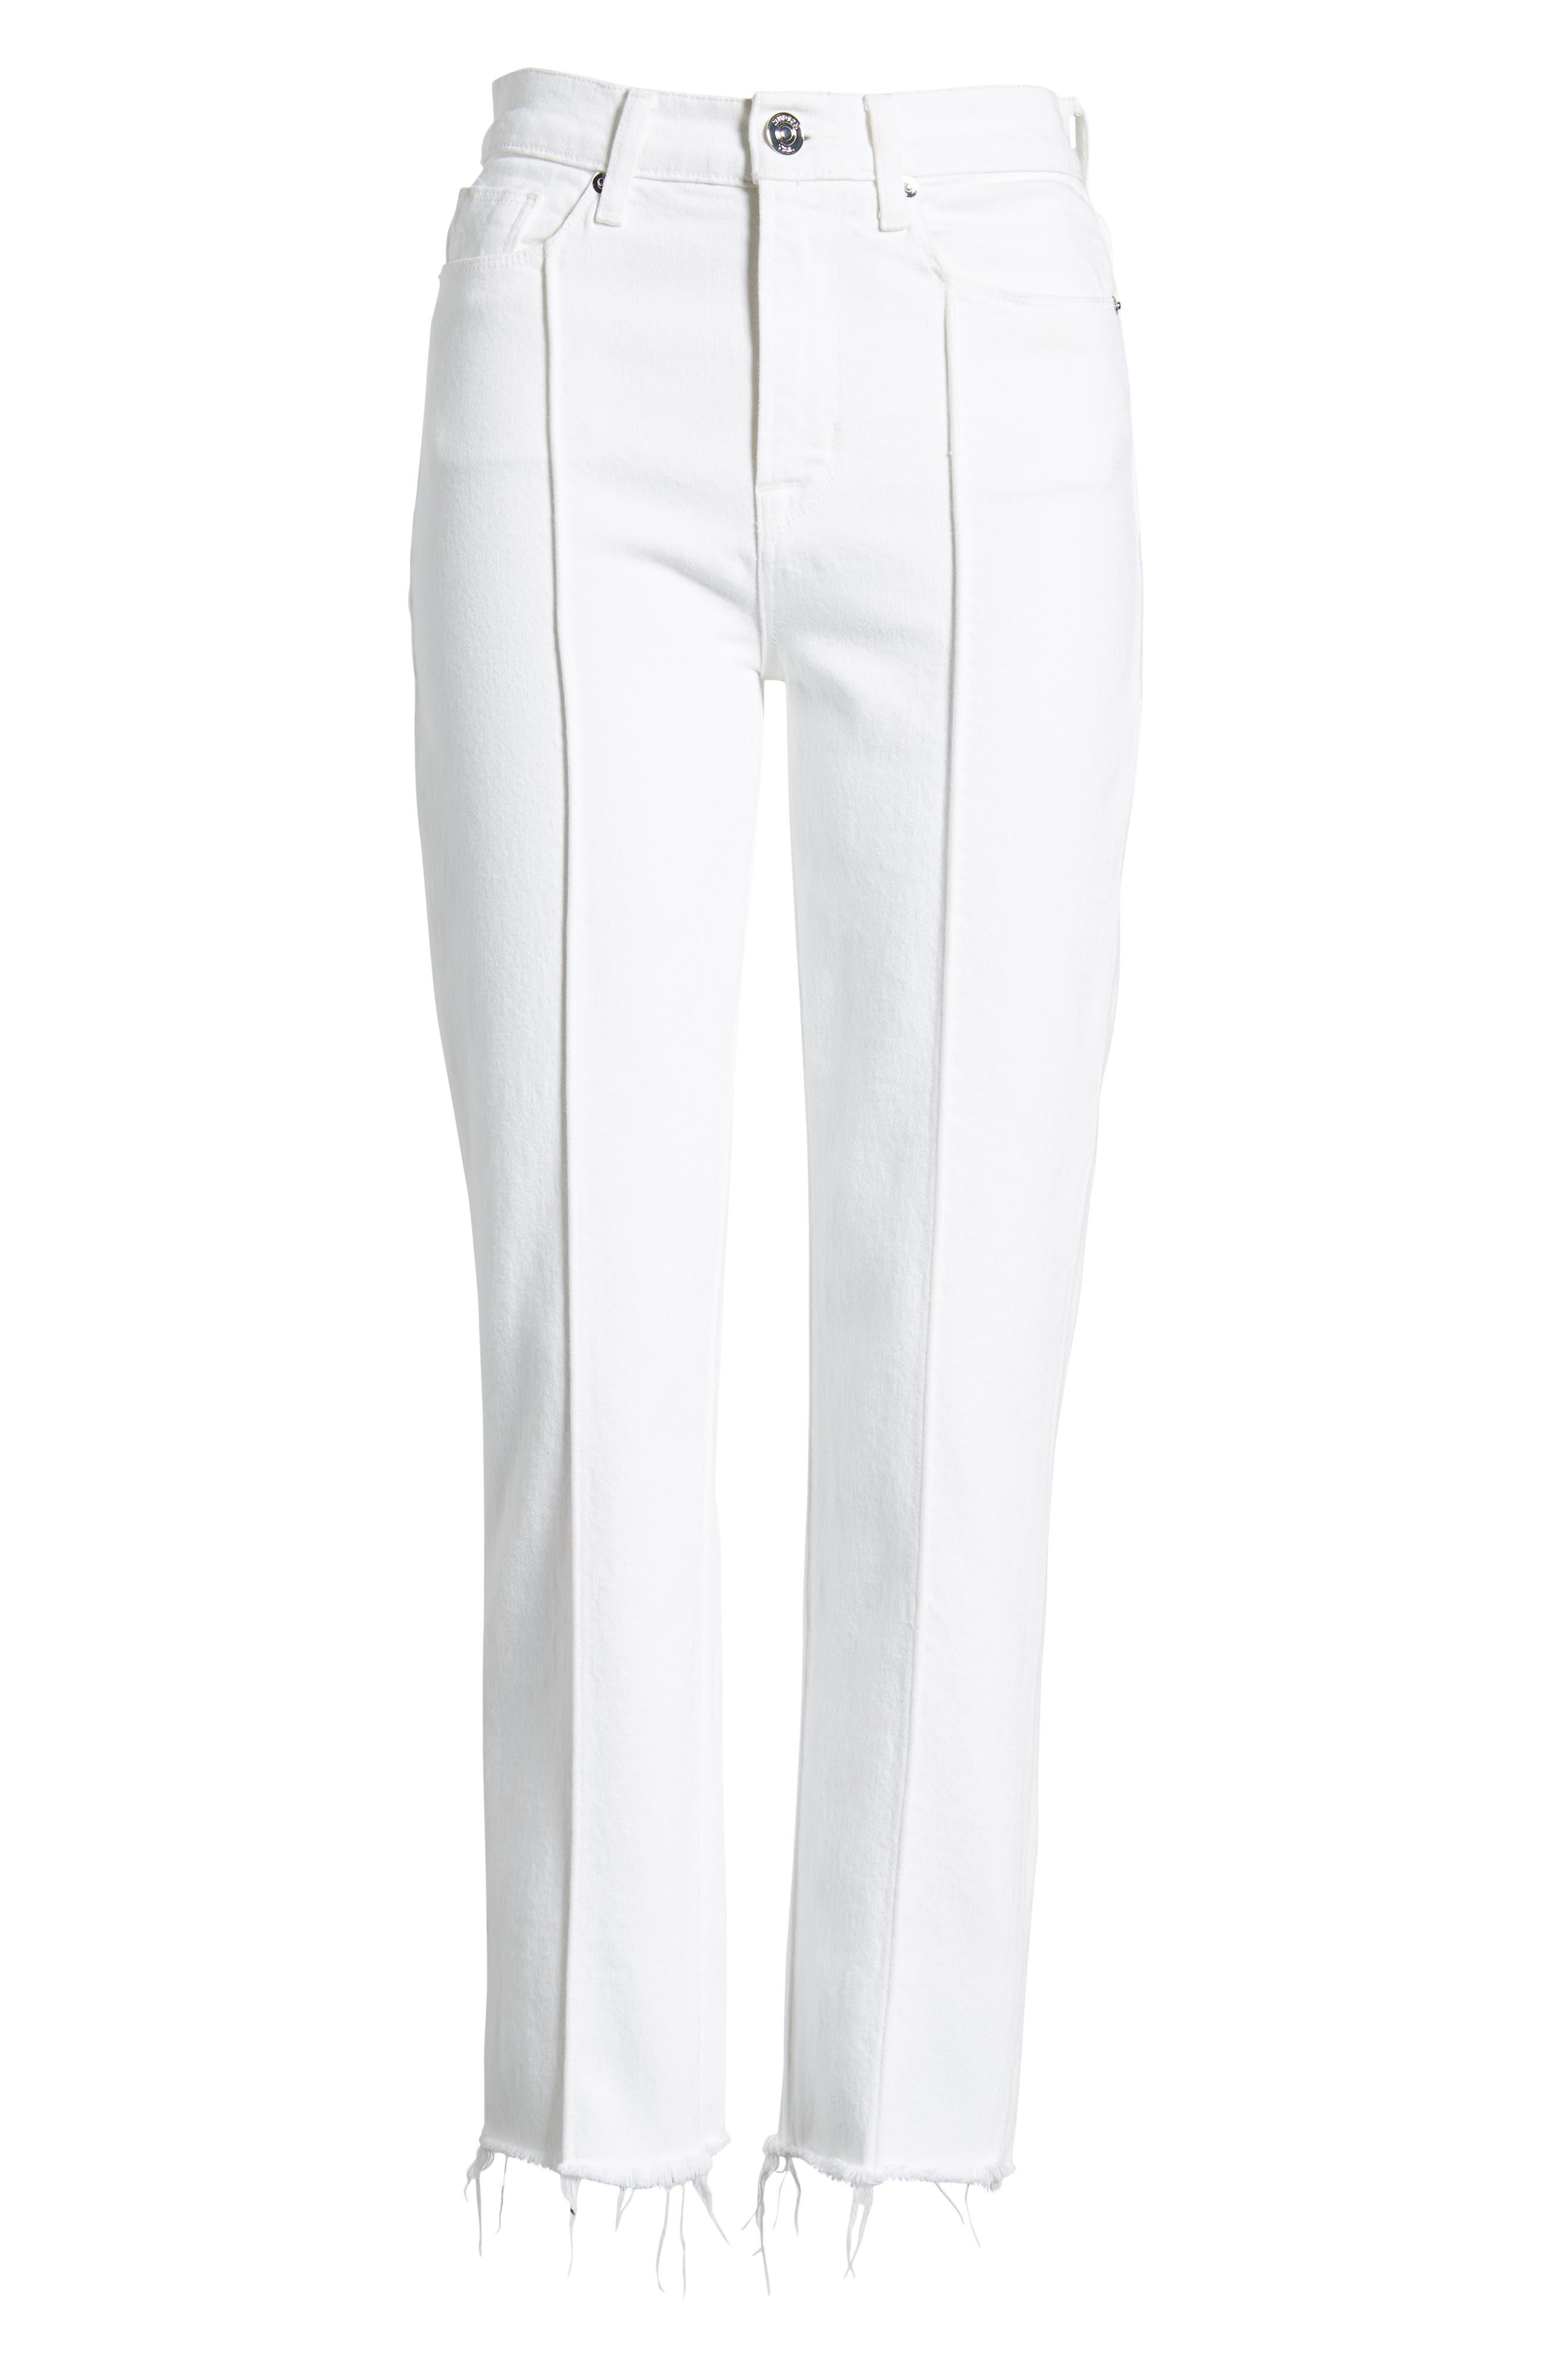 Zoeey Pintuck High Waist Crop Straight Leg Jeans,                             Alternate thumbnail 7, color,                             120